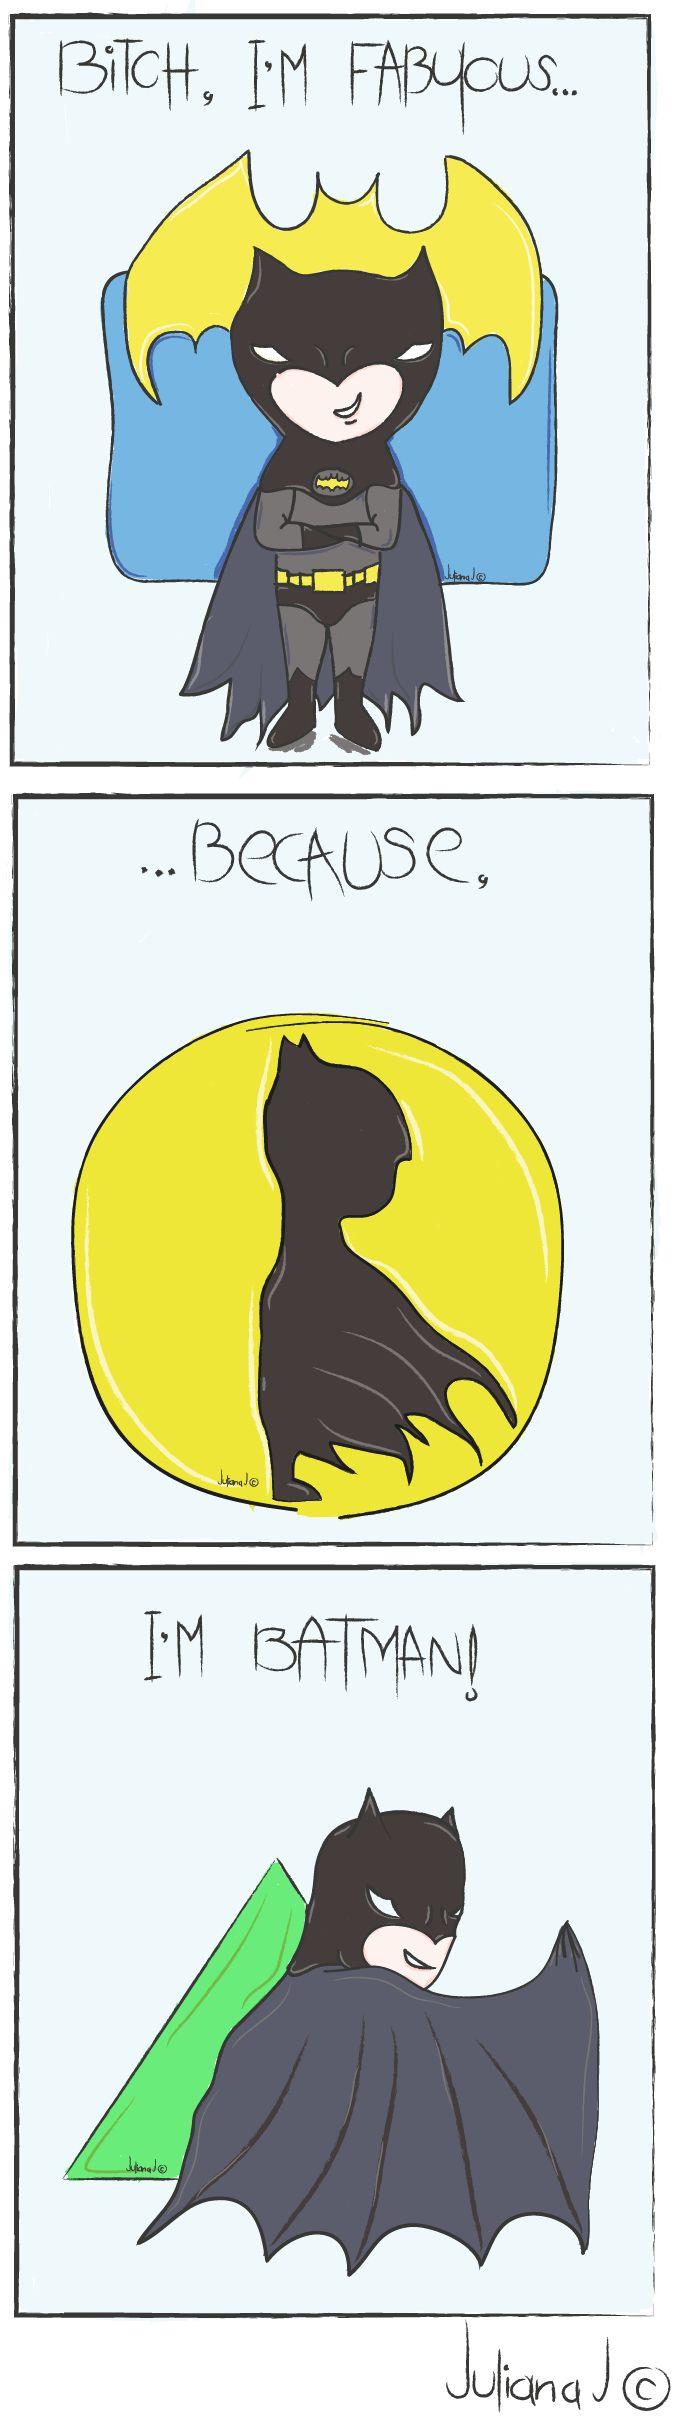 Nananana, BATMAN! #Batman #Ilustration